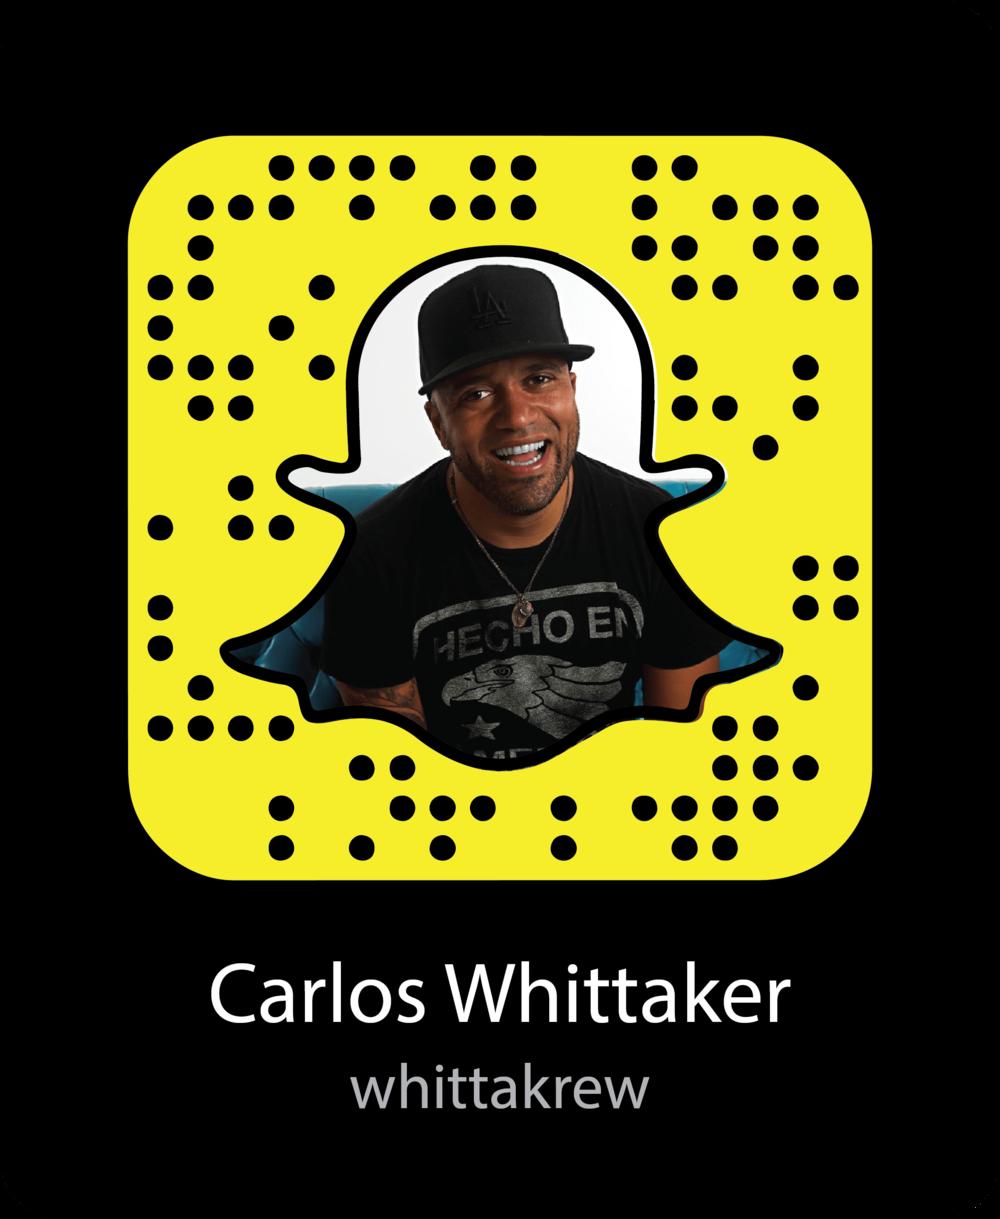 carlos-whittaker-storytellers-snapchat-snapcode